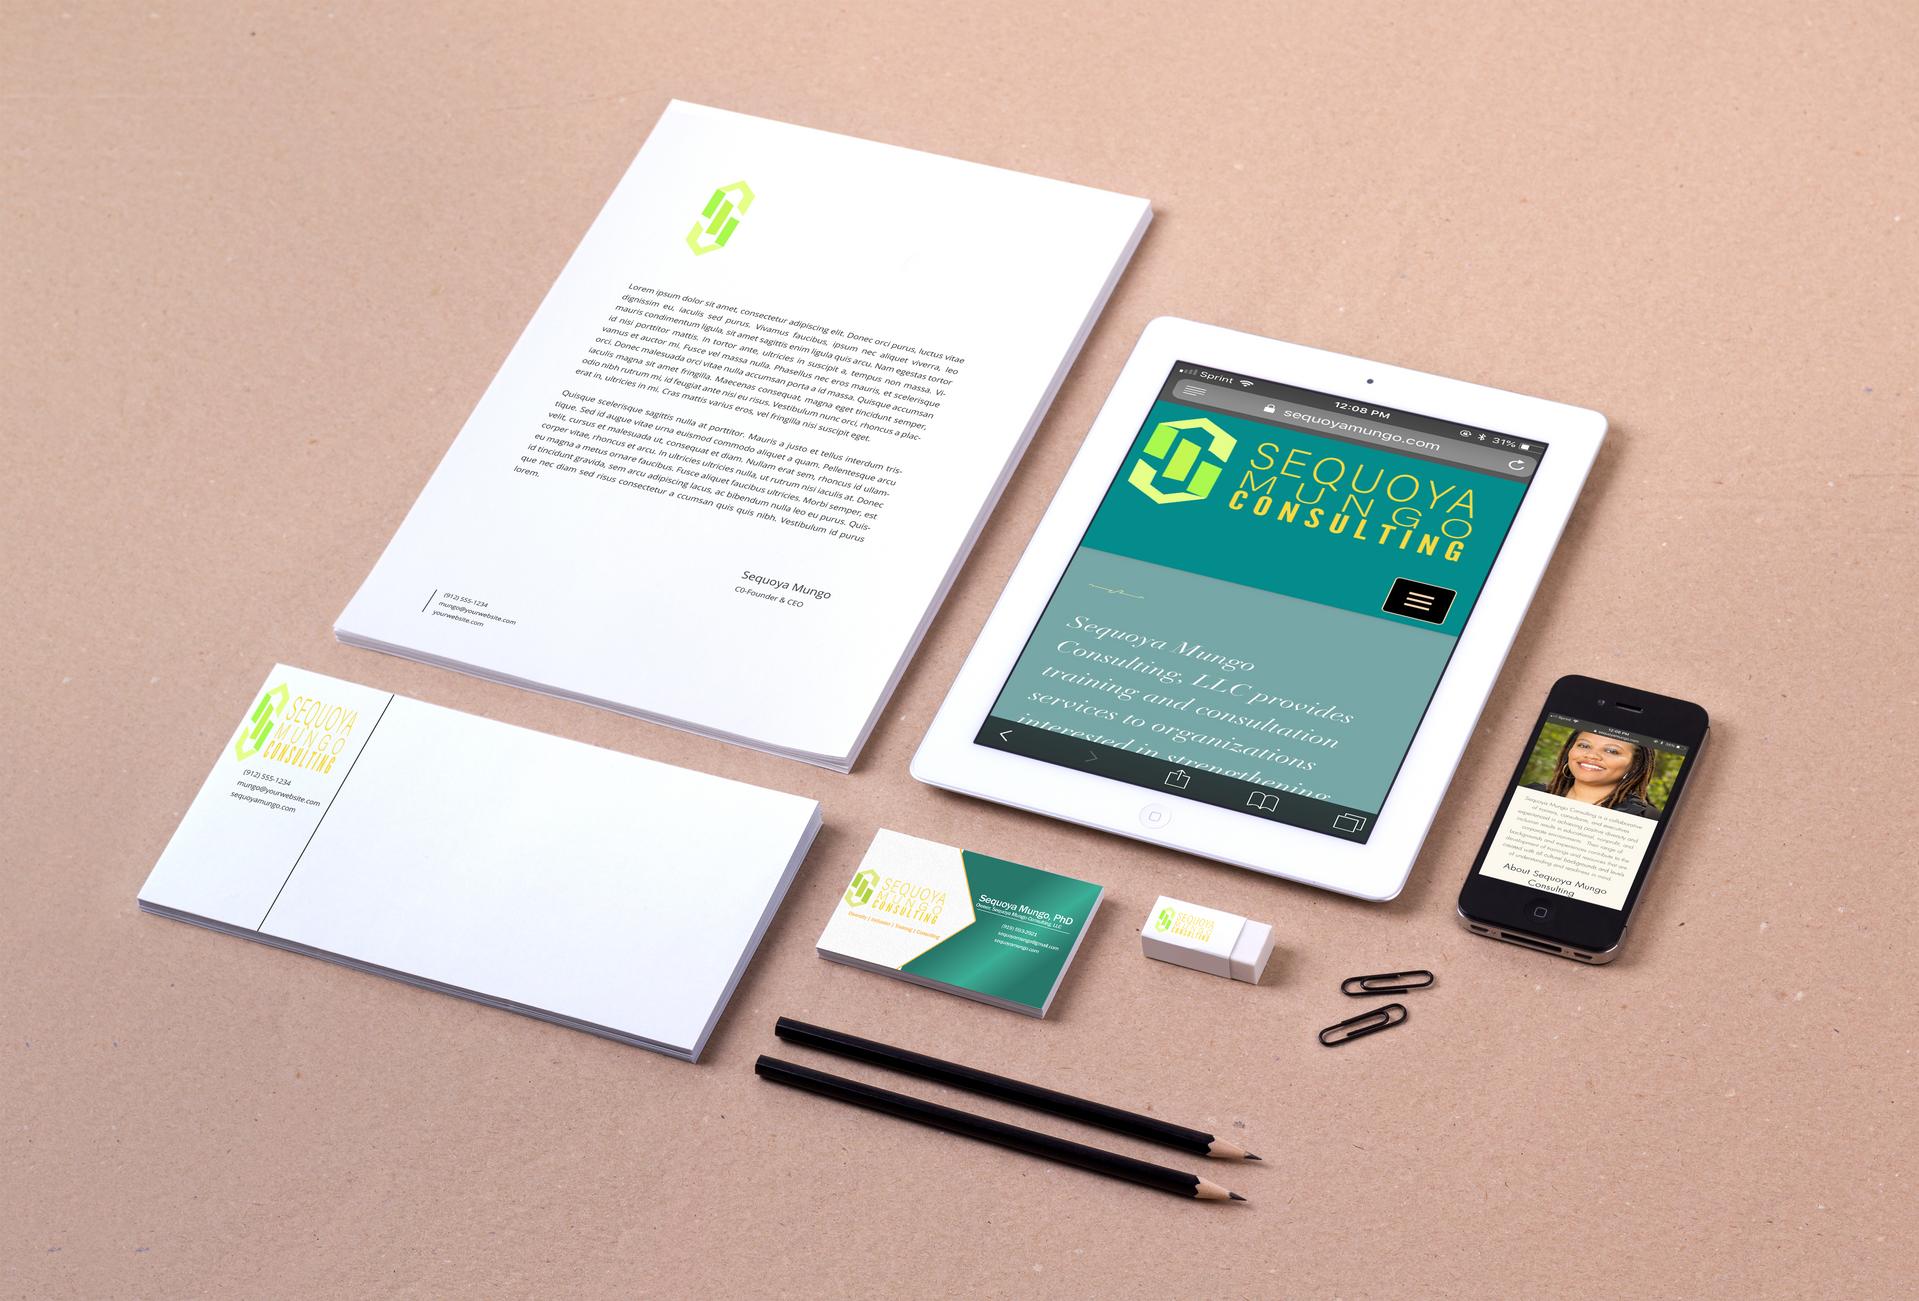 Sequoya Mungo design layout.png